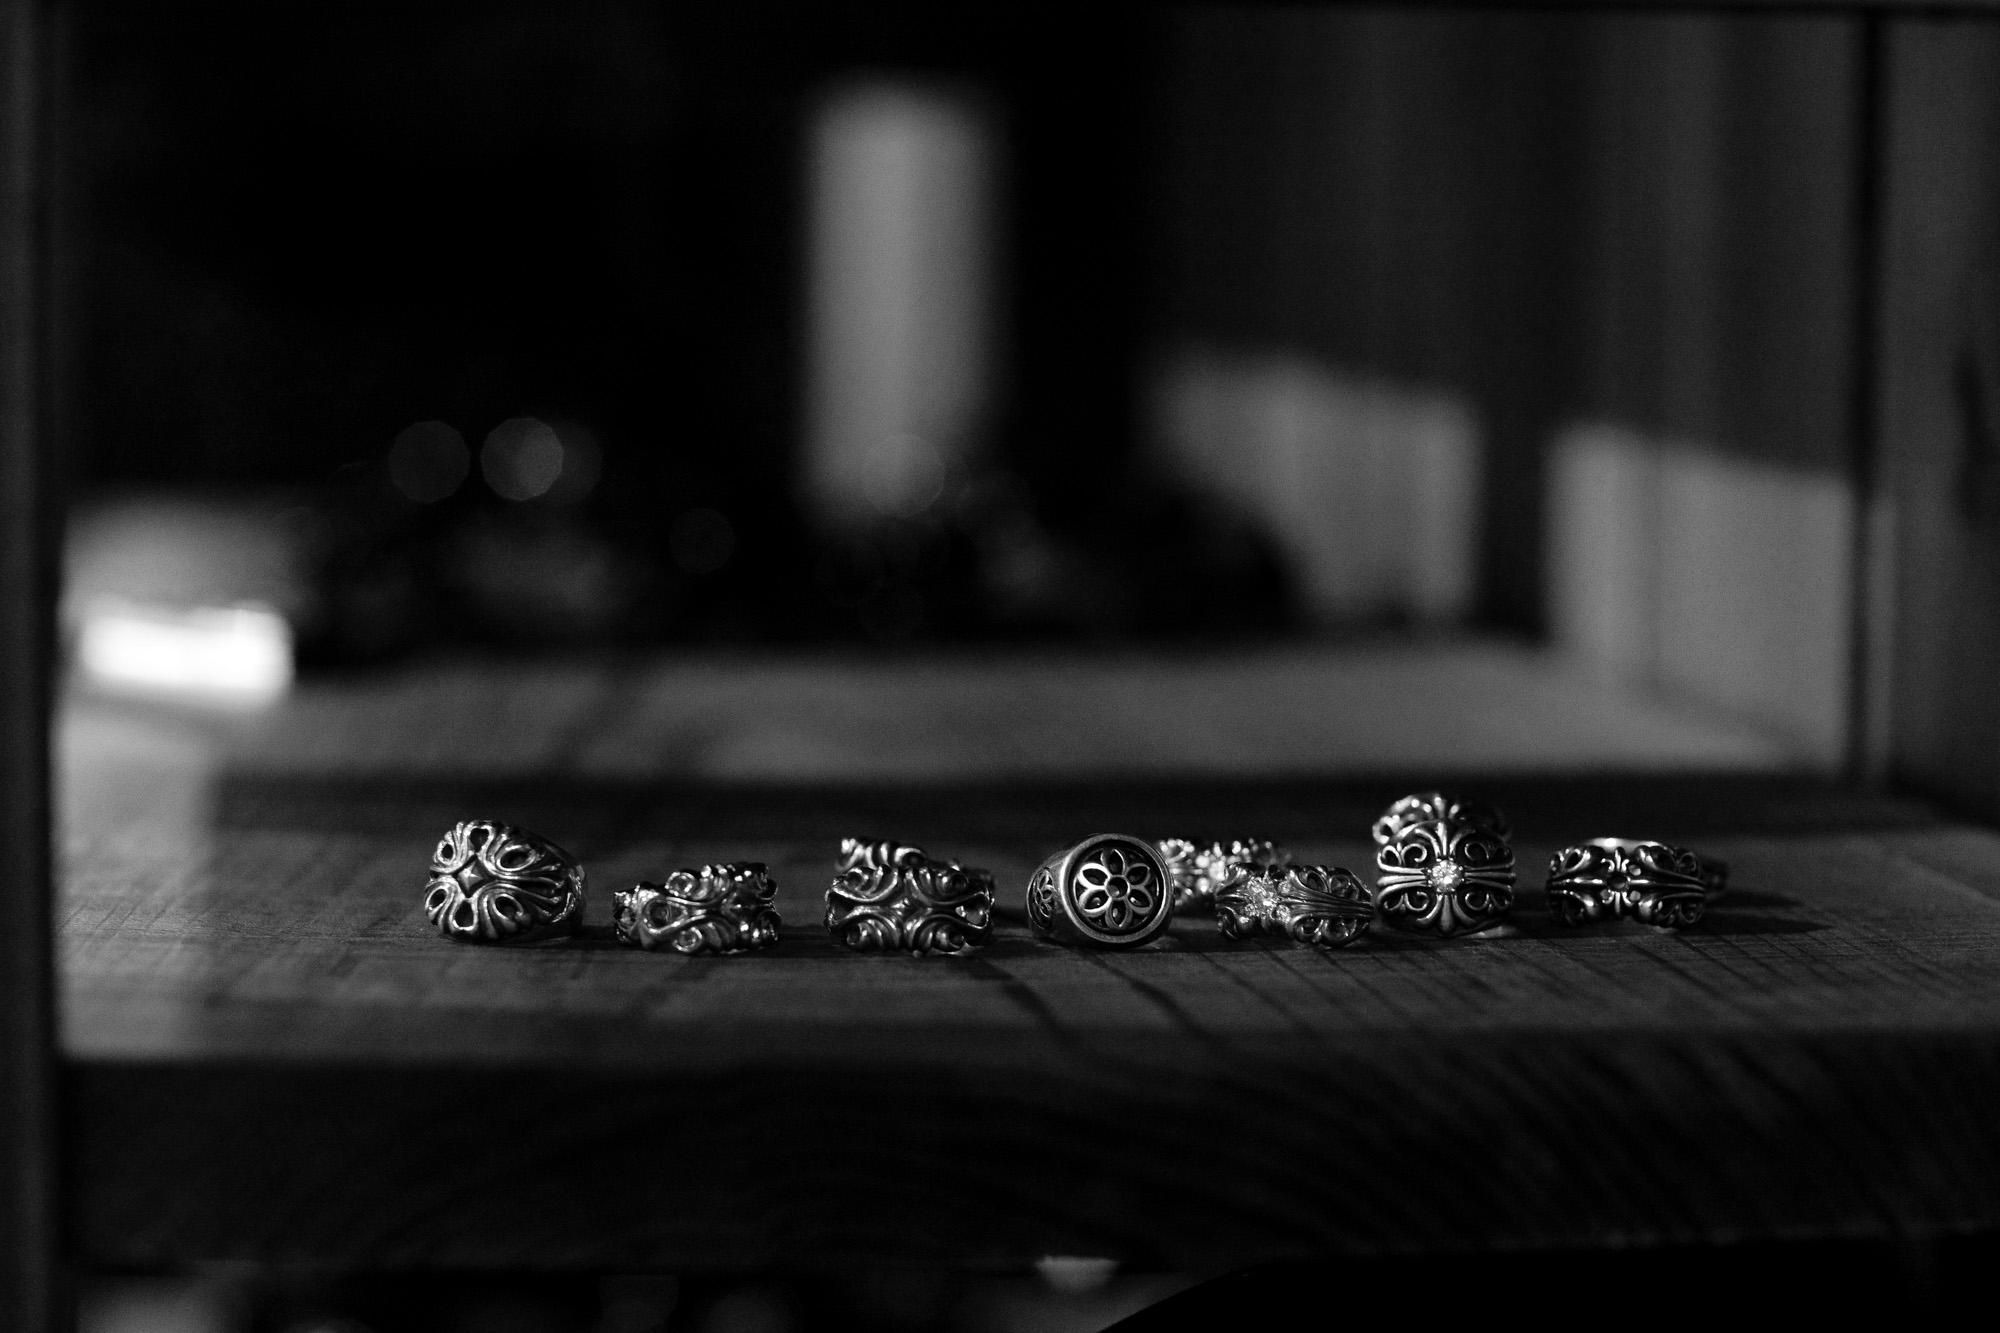 Balvenie Wilhelm VICKERS RING 925 SILVER × Balvenie Wilhelm VALIANT RING 22K GOLD × Balvenie Wilhelm VALIANT RING 925 SILVER × Balvenie Wilhelm VALIANT RING 925 SILVER × Good Art HLYWD MEDIUM CLUB RING 925 SILVER × CHROME HEARTS K&T RING 5 WHITE DIAMOND 22K × CHROME HEARTS K&T RING 5 WHITE DIAMOND 22K × CHROME HEARTS KEEPER RING WHITE DIAMOND 925silver × CHROME HEARTS KEEPER RING WHITE DIAMOND 925silver × CHROME HEARTS Narrow V Band CH+ 925silver Balvenie Wilhelm (バルヴェニー ヴィルヘルム) VICKERS RING 925 SILVER ヴィッカース リング VALIANT RING 22K GOLD ヴァリアント リング GOLD (ゴールド)VALIANT RING 925 SILVER ヴァリアント リング SILVER (シルバー) Good Art HLYWD グッドアート ハリウッド  MEDIUM CLUB RING ミディアム クラブリング SILVER(シルバー) CHROME HEARTS K&T RING 5 WHITE DIAMOND 22K クロムーハーツ KTリング ワンダイヤ 22Kゴールド キーパーリング 22Kゴールド 愛知 名古屋 Alto e DIritto altoediritto アルトエデリット リング ゴールドリング